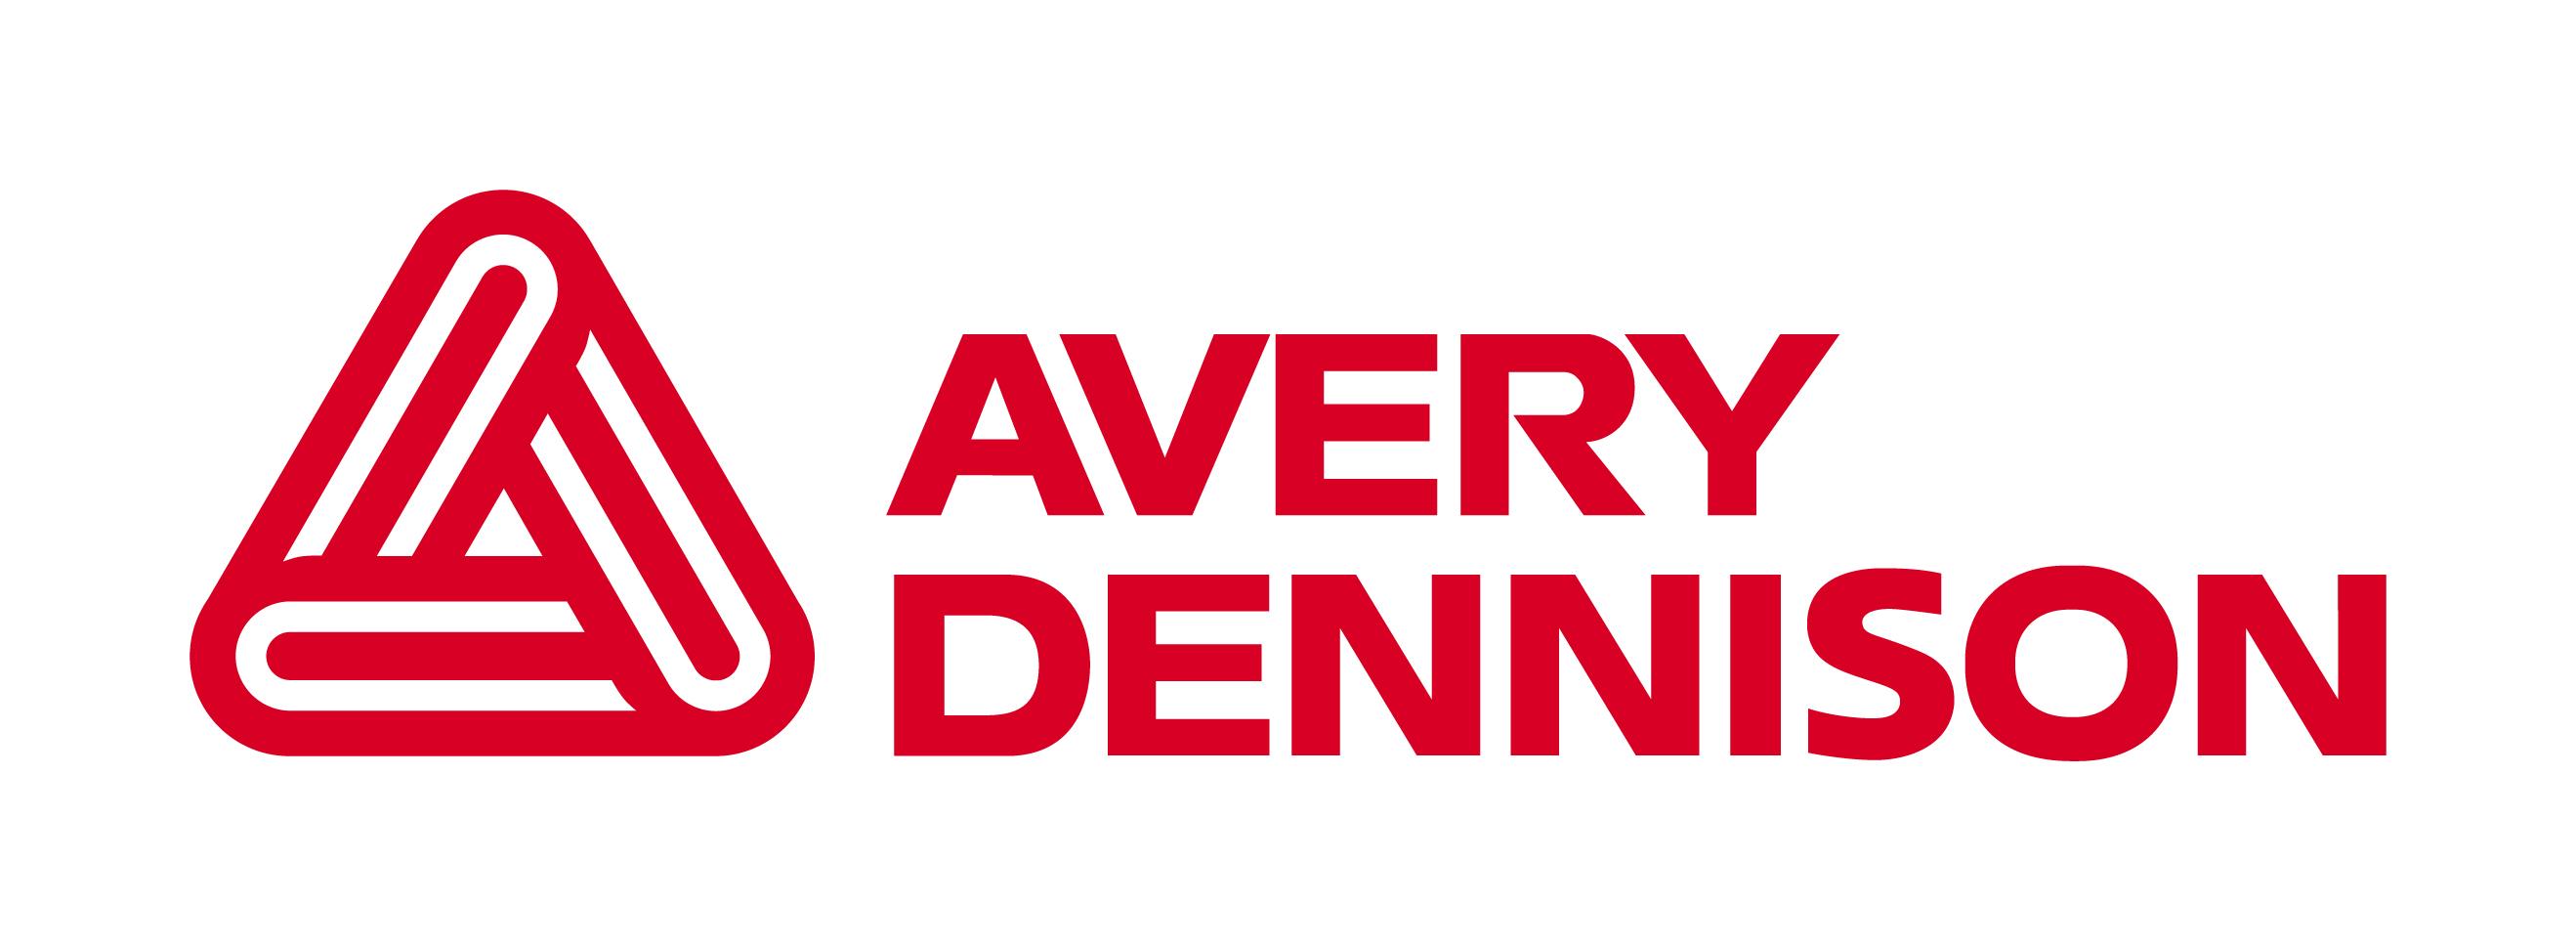 AVERY DENNISON SC900 SUPERCAST